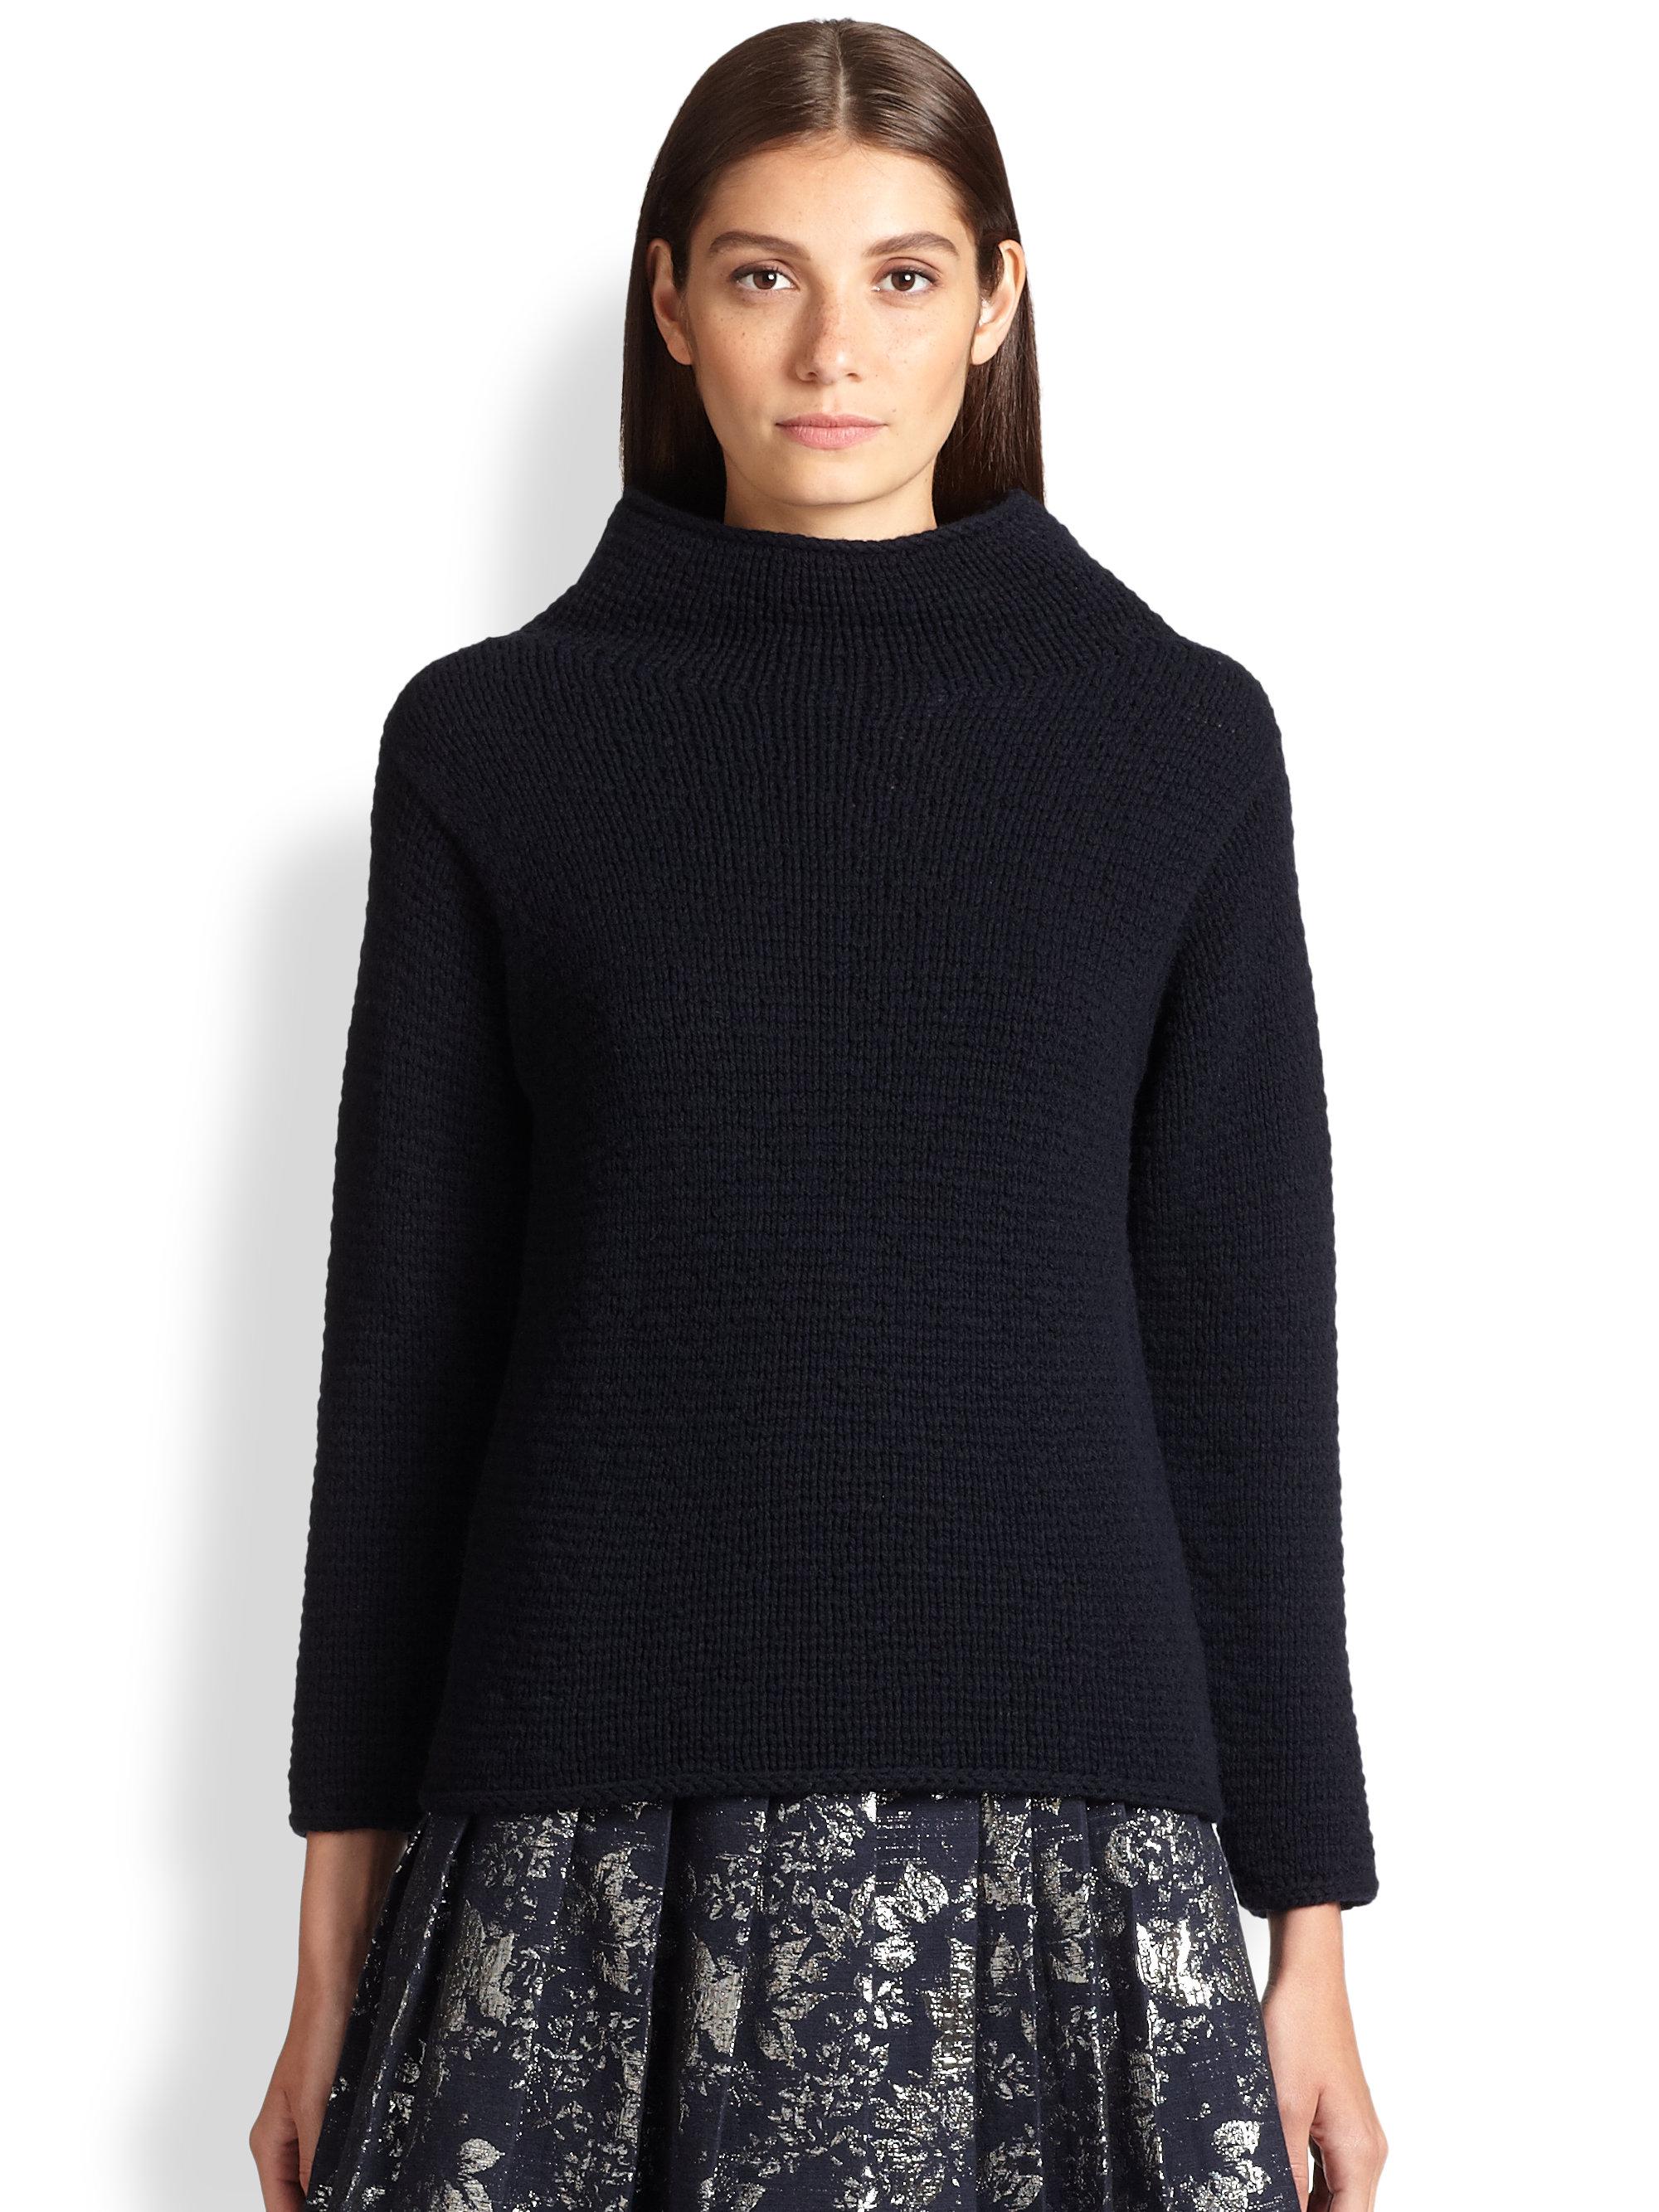 Wool Sweater Grey: Max Mara Olmo Wool Cashmere Sweater In Blue